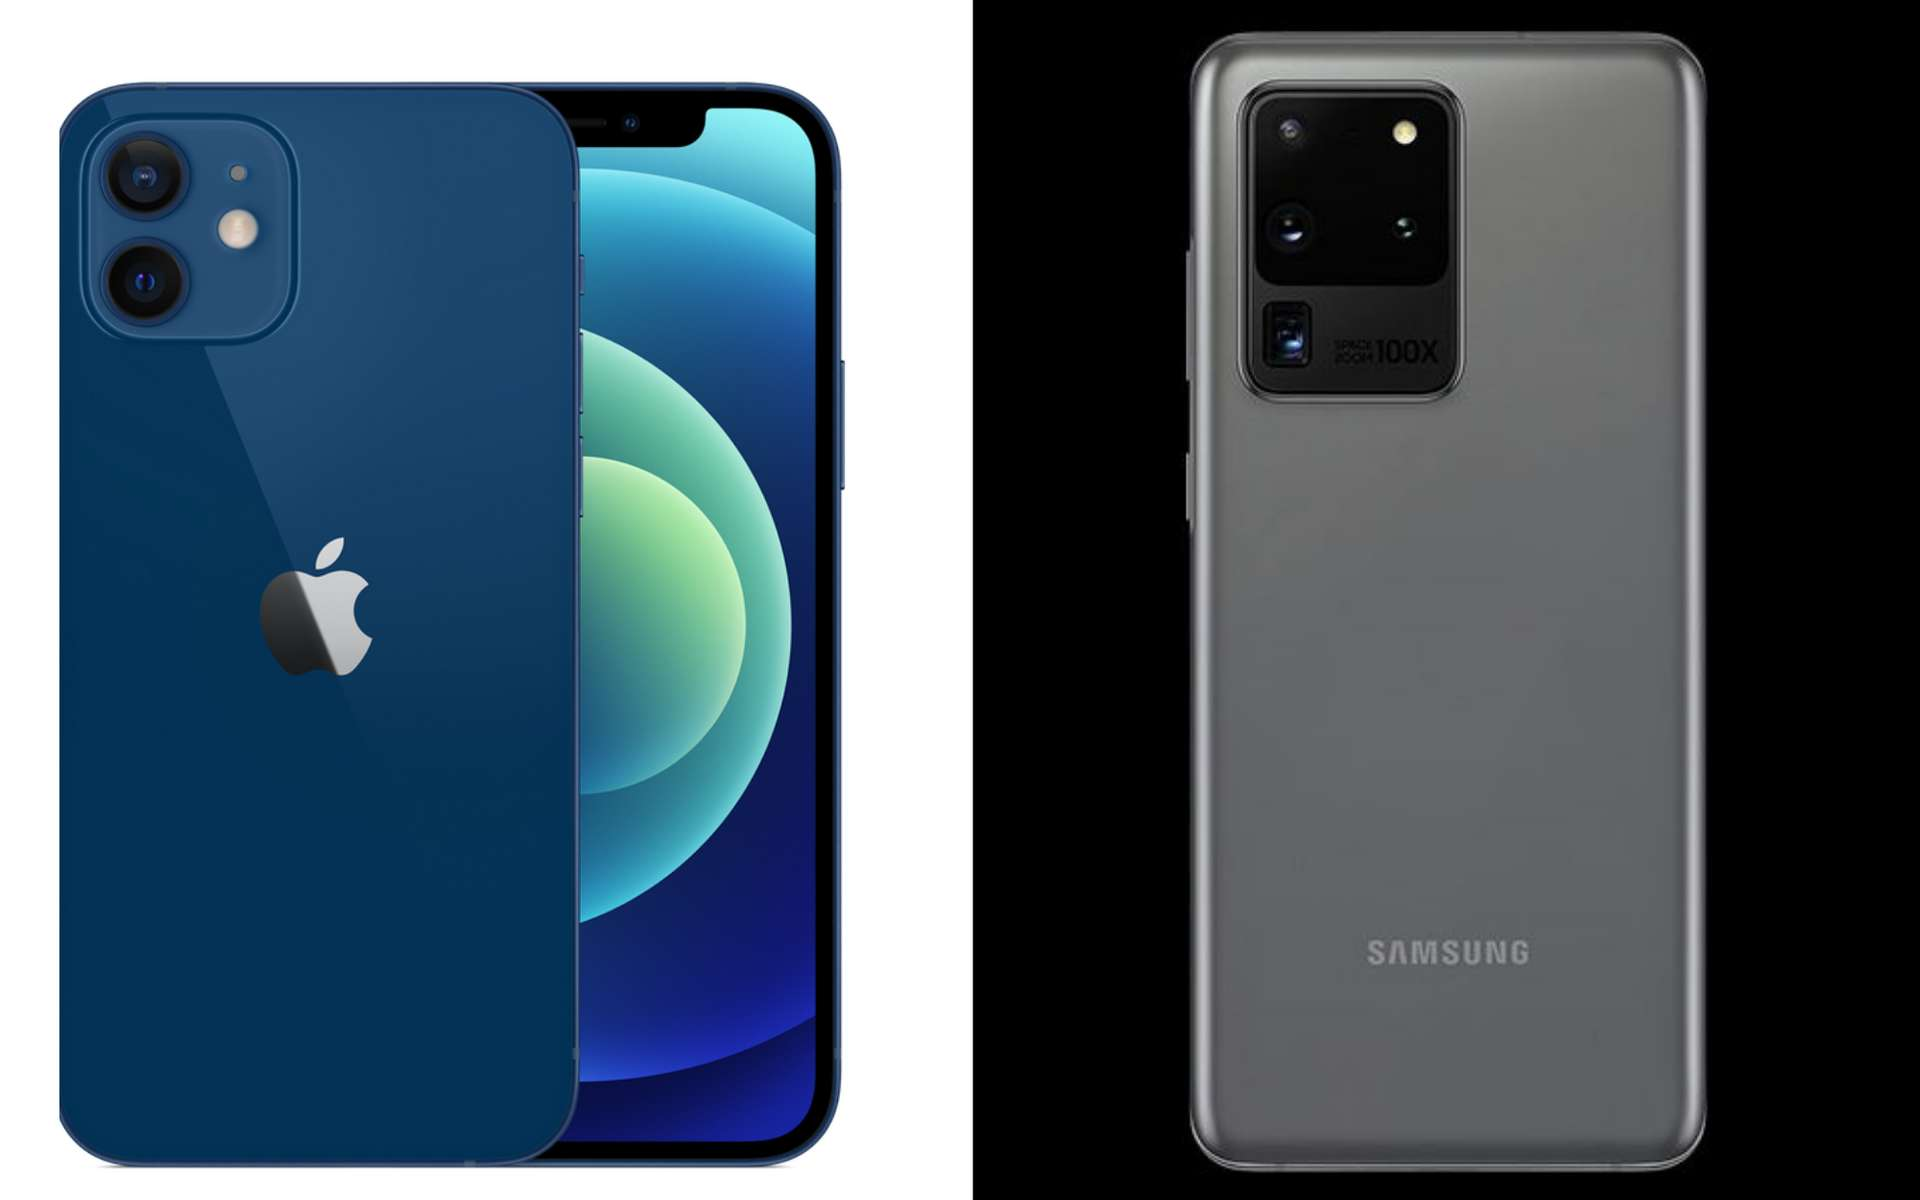 L'iPhone 12 Mini 64 Go et le Samsung Galaxy S20+ 5G en promo chez Rakuten